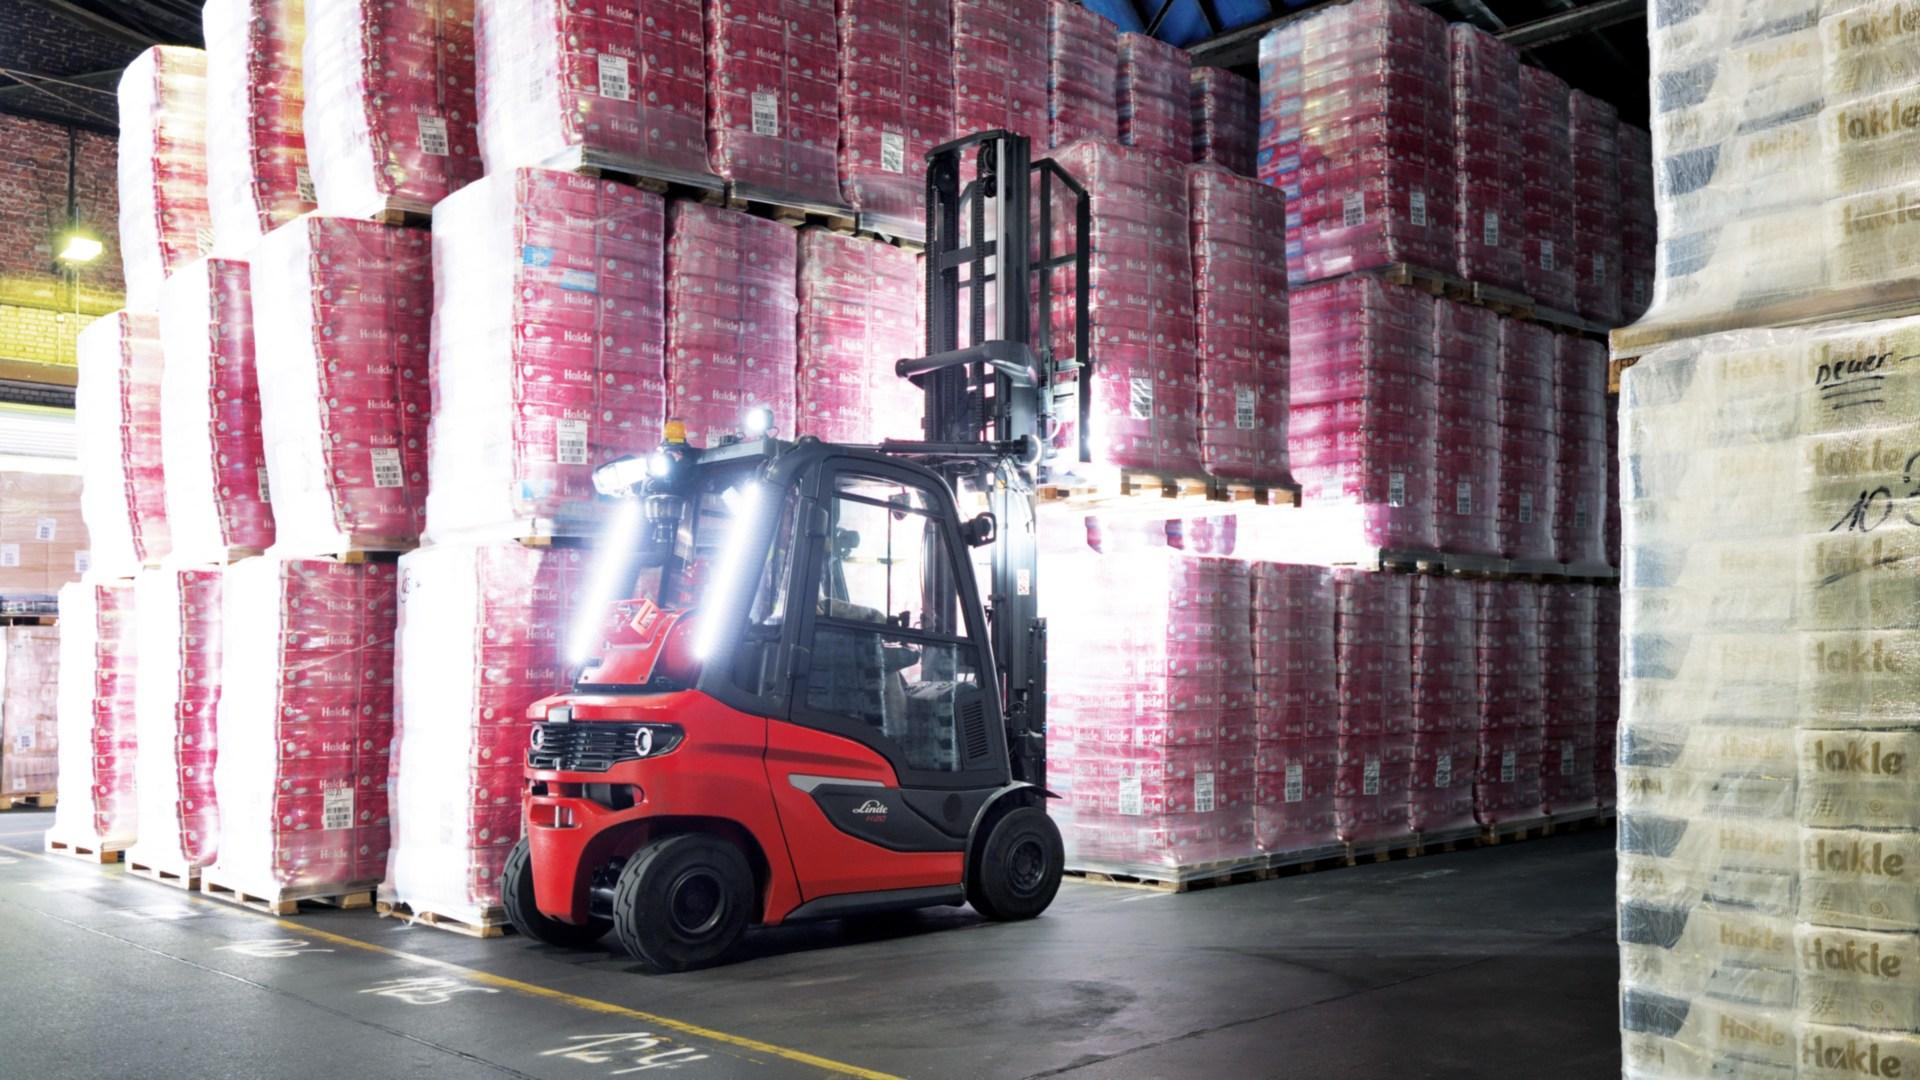 ic_truck-H20_H35-1202-Order_Picking-4549_1523_16x9w1920